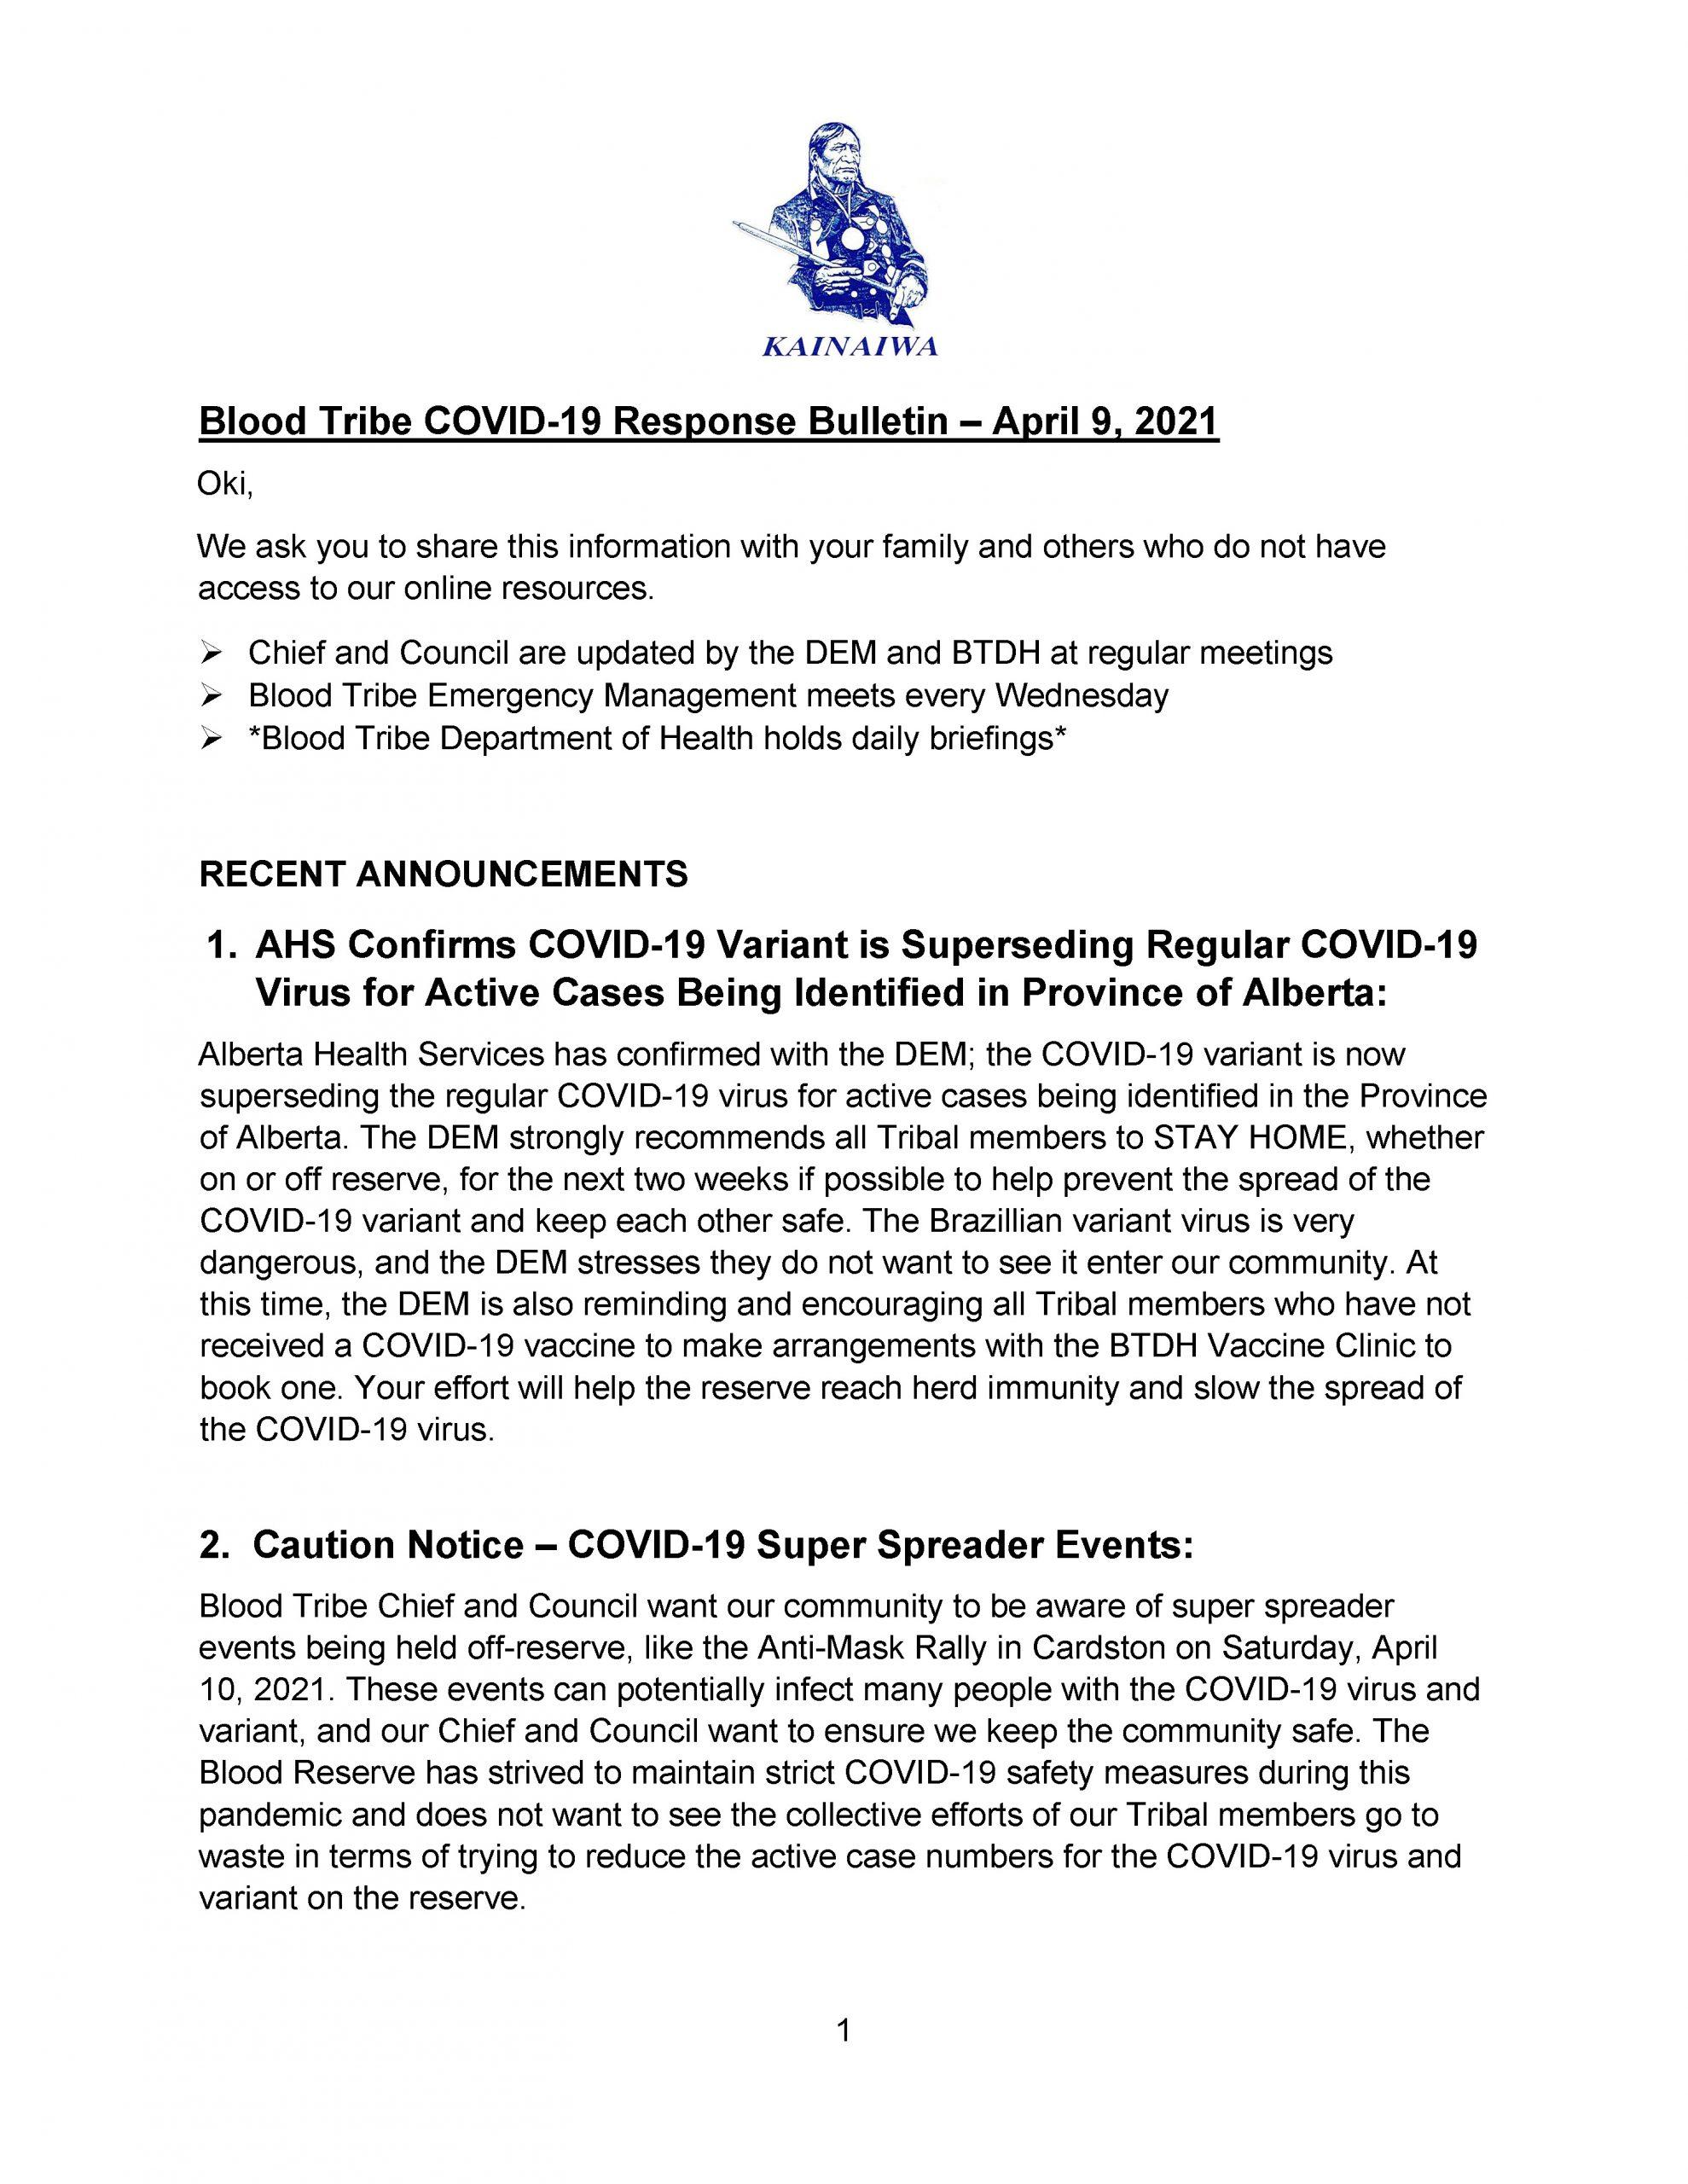 Blood Tribe COVID-19 Response Bulletin – (April 9, 2021) - Page 1